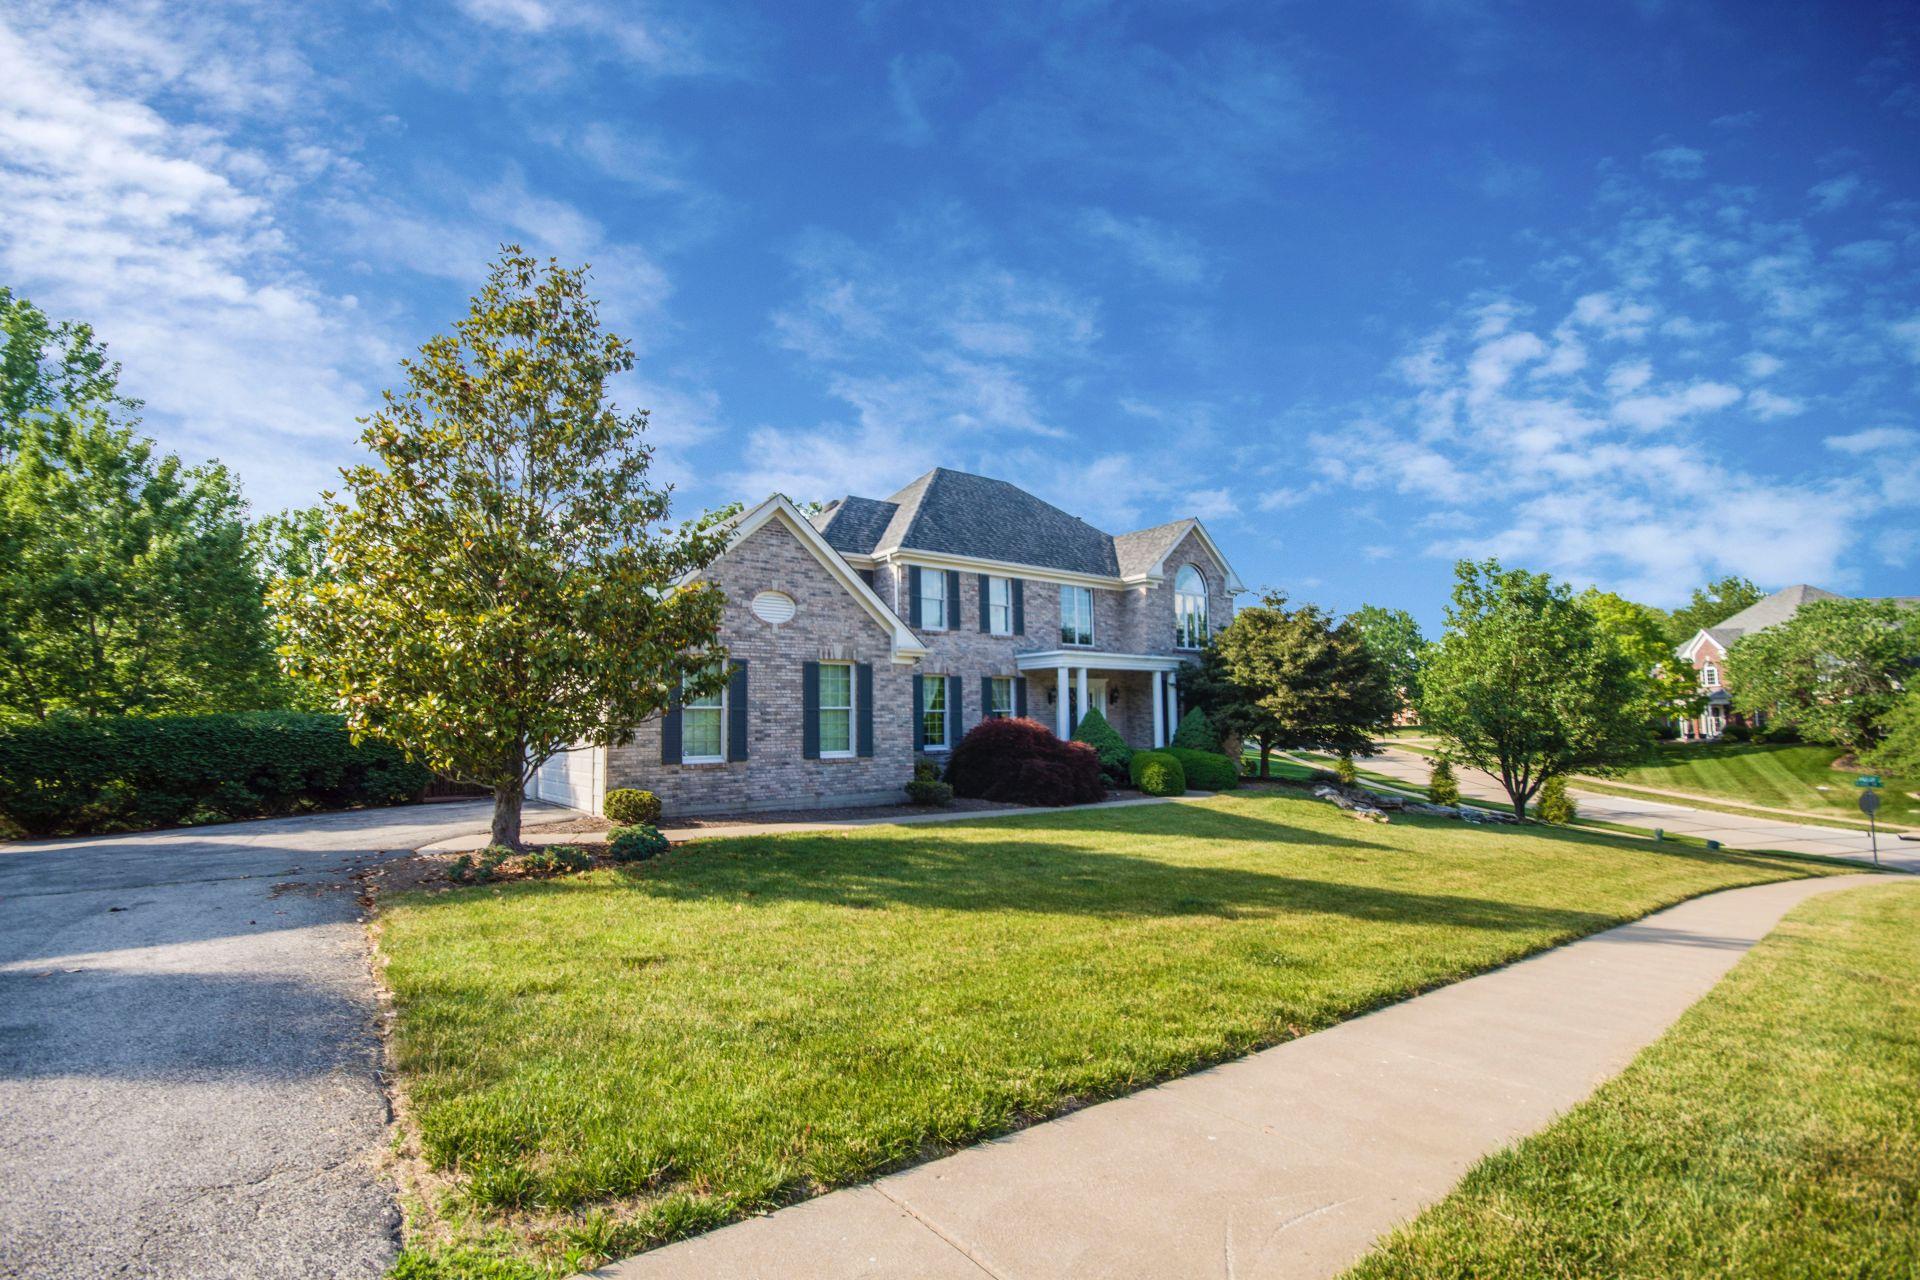 Pine Tree Estates Homes for Sale in Parkland